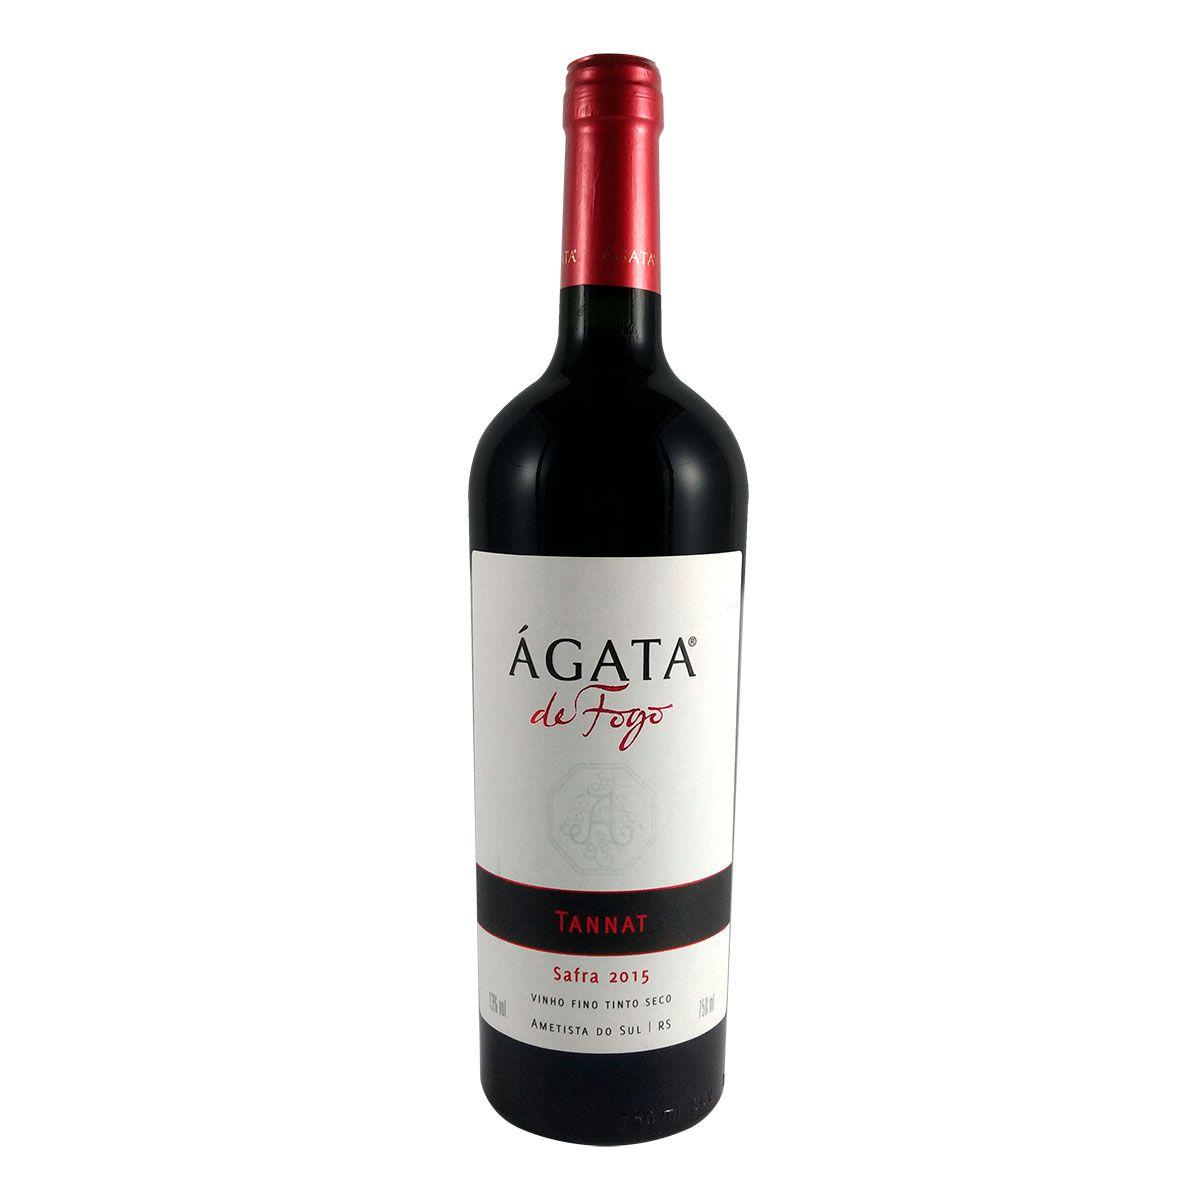 Vinho Fino Tinto Seco Ágata de Fogo Tannat 2015 750ml